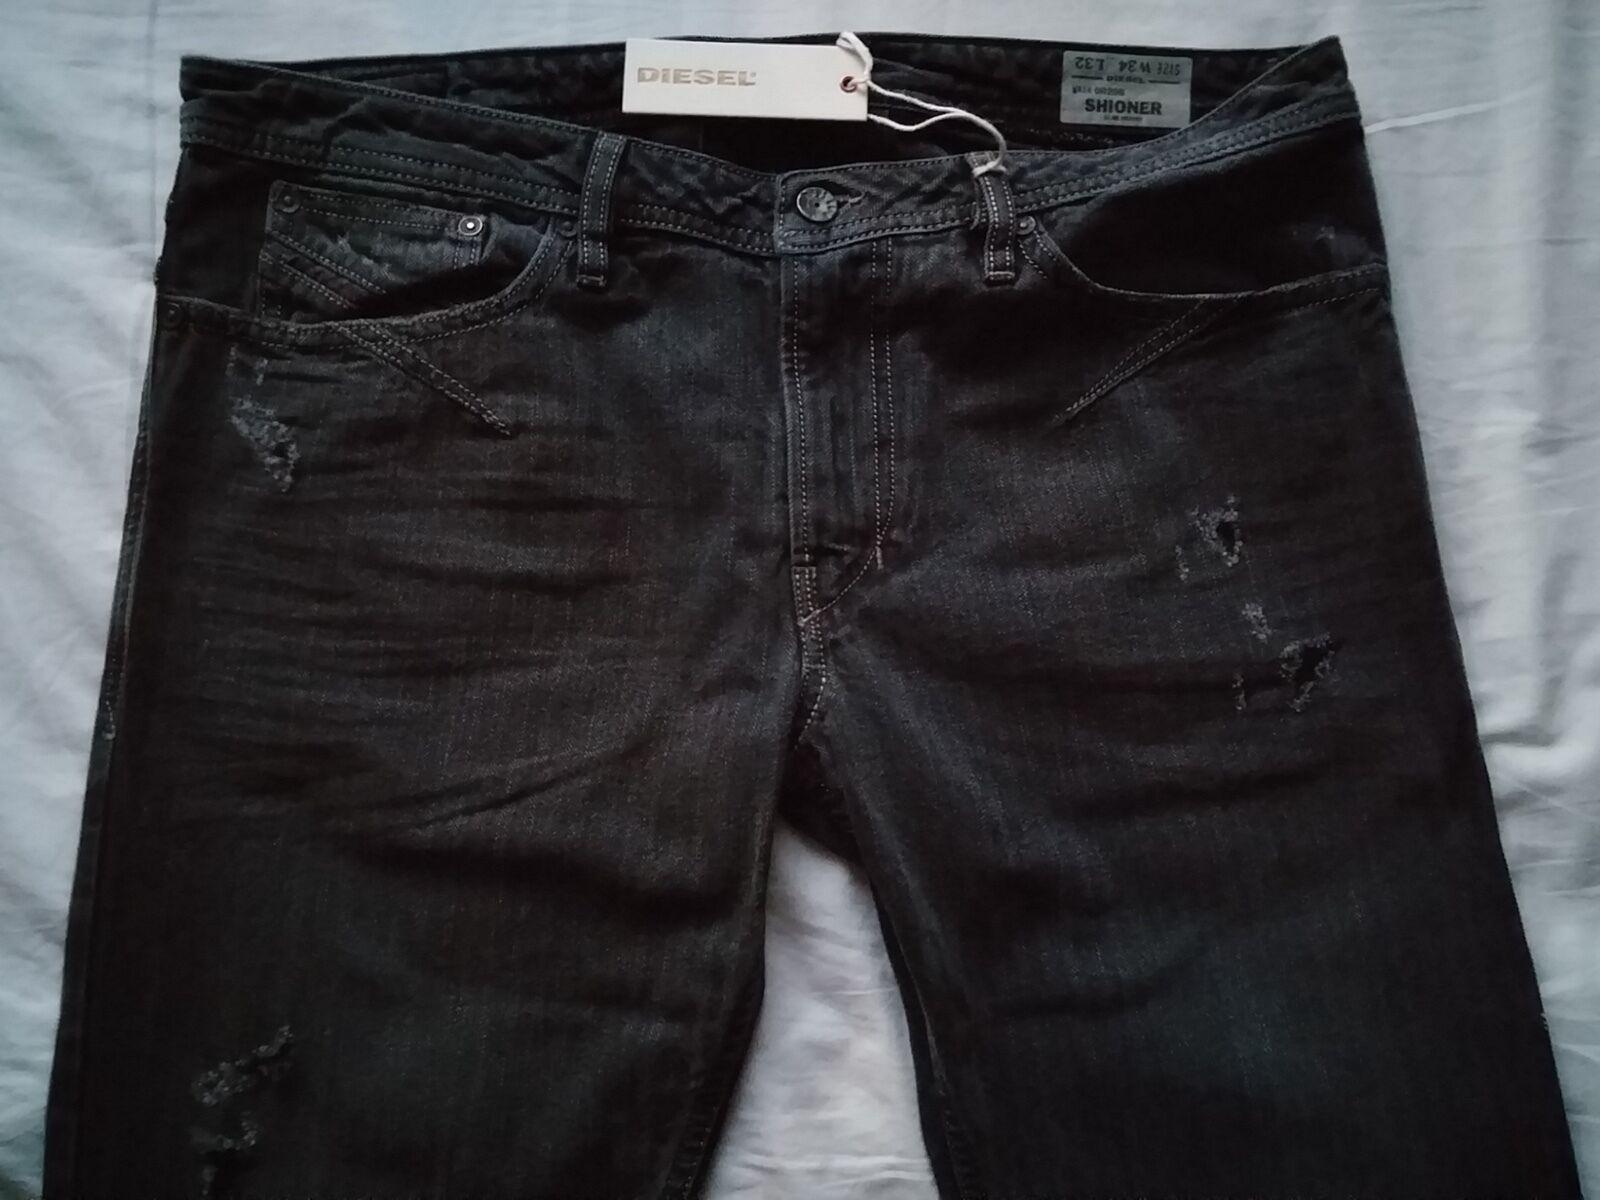 Diesel SHIONER 0R20B Slim-Skinny Men's Denim Jeans Trousers W34 L32